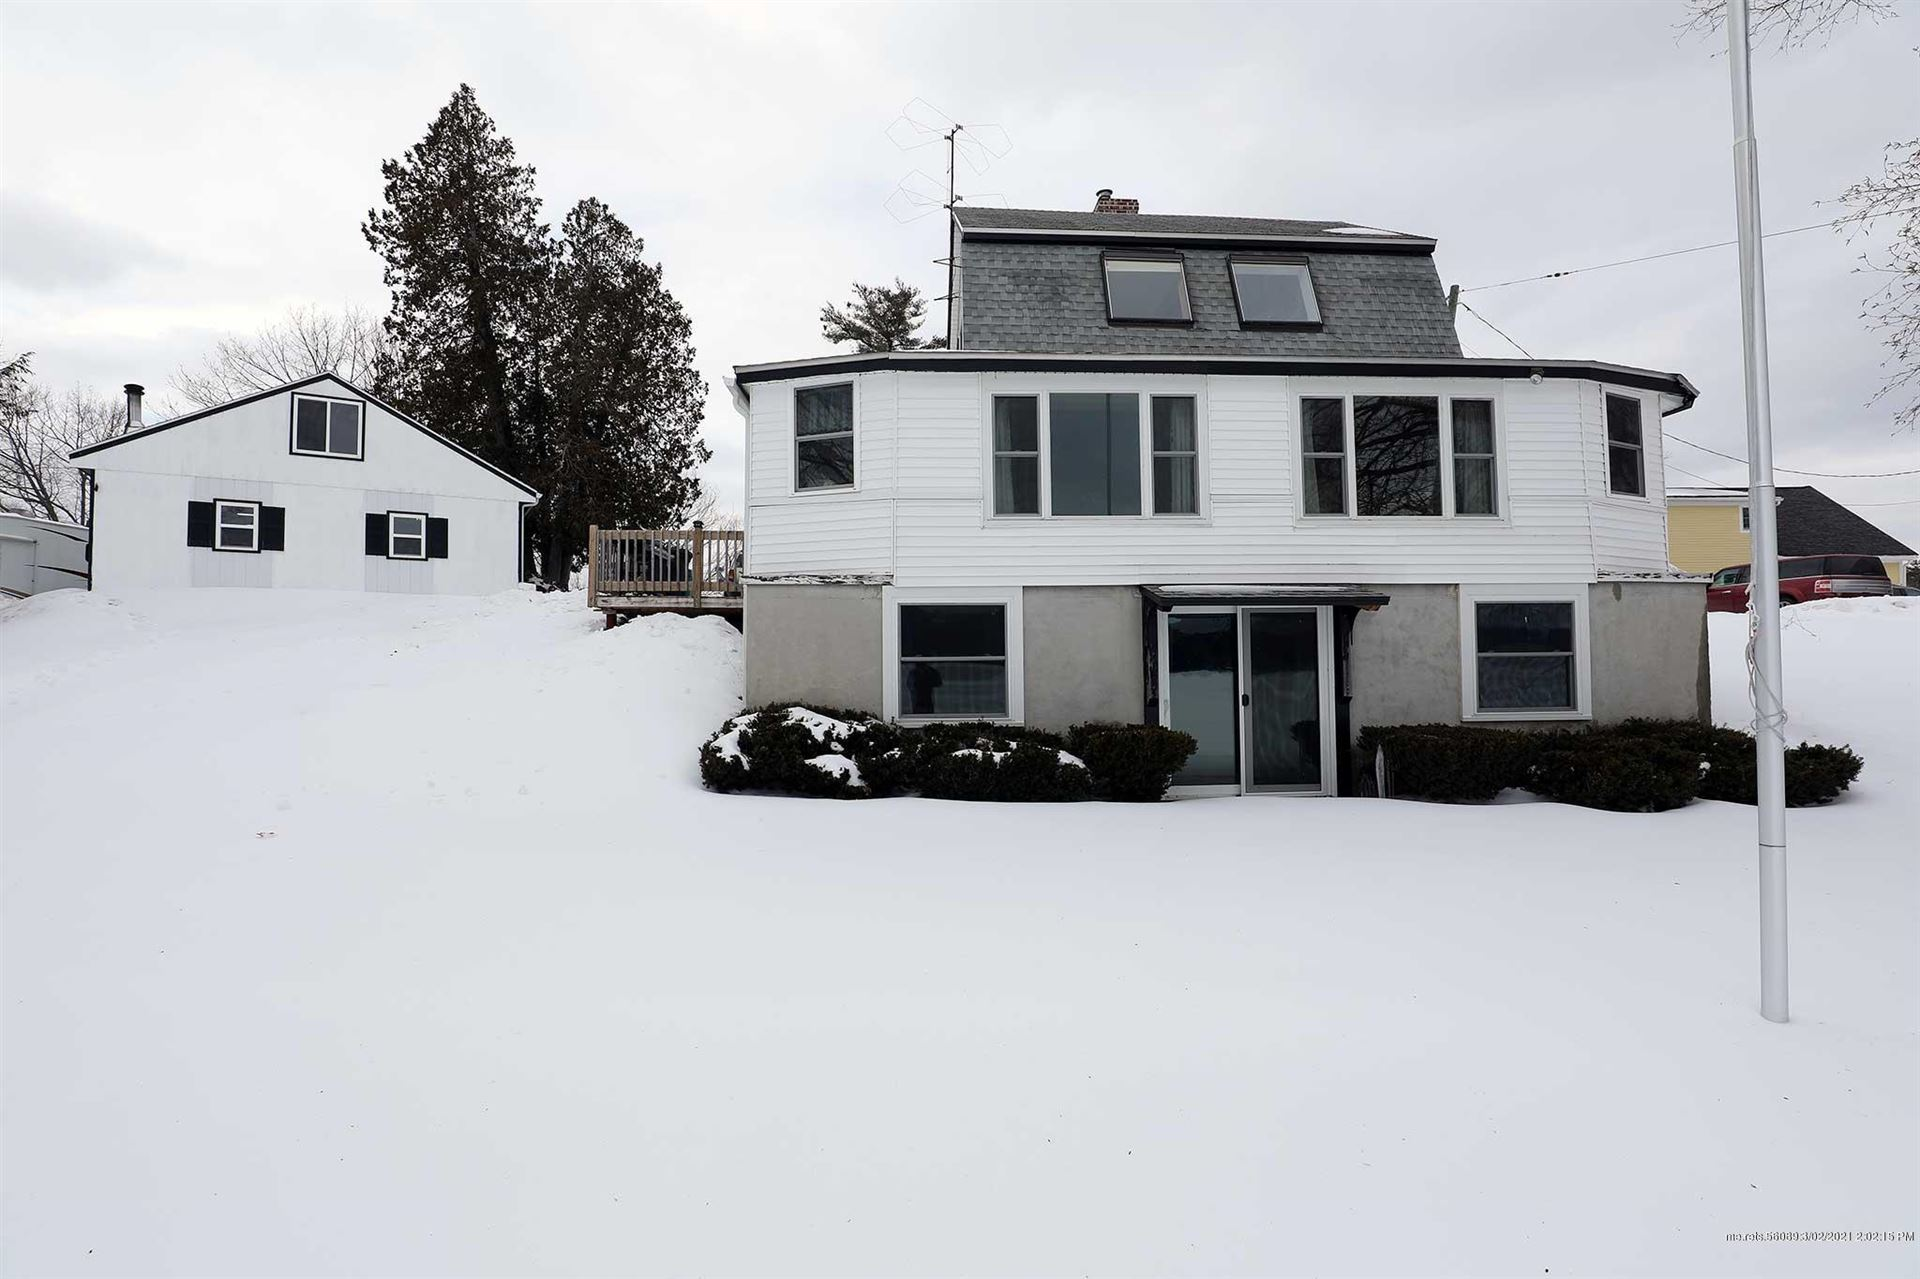 Photo of 9 Weeks Road, Vassalboro, ME 04989 (MLS # 1482993)